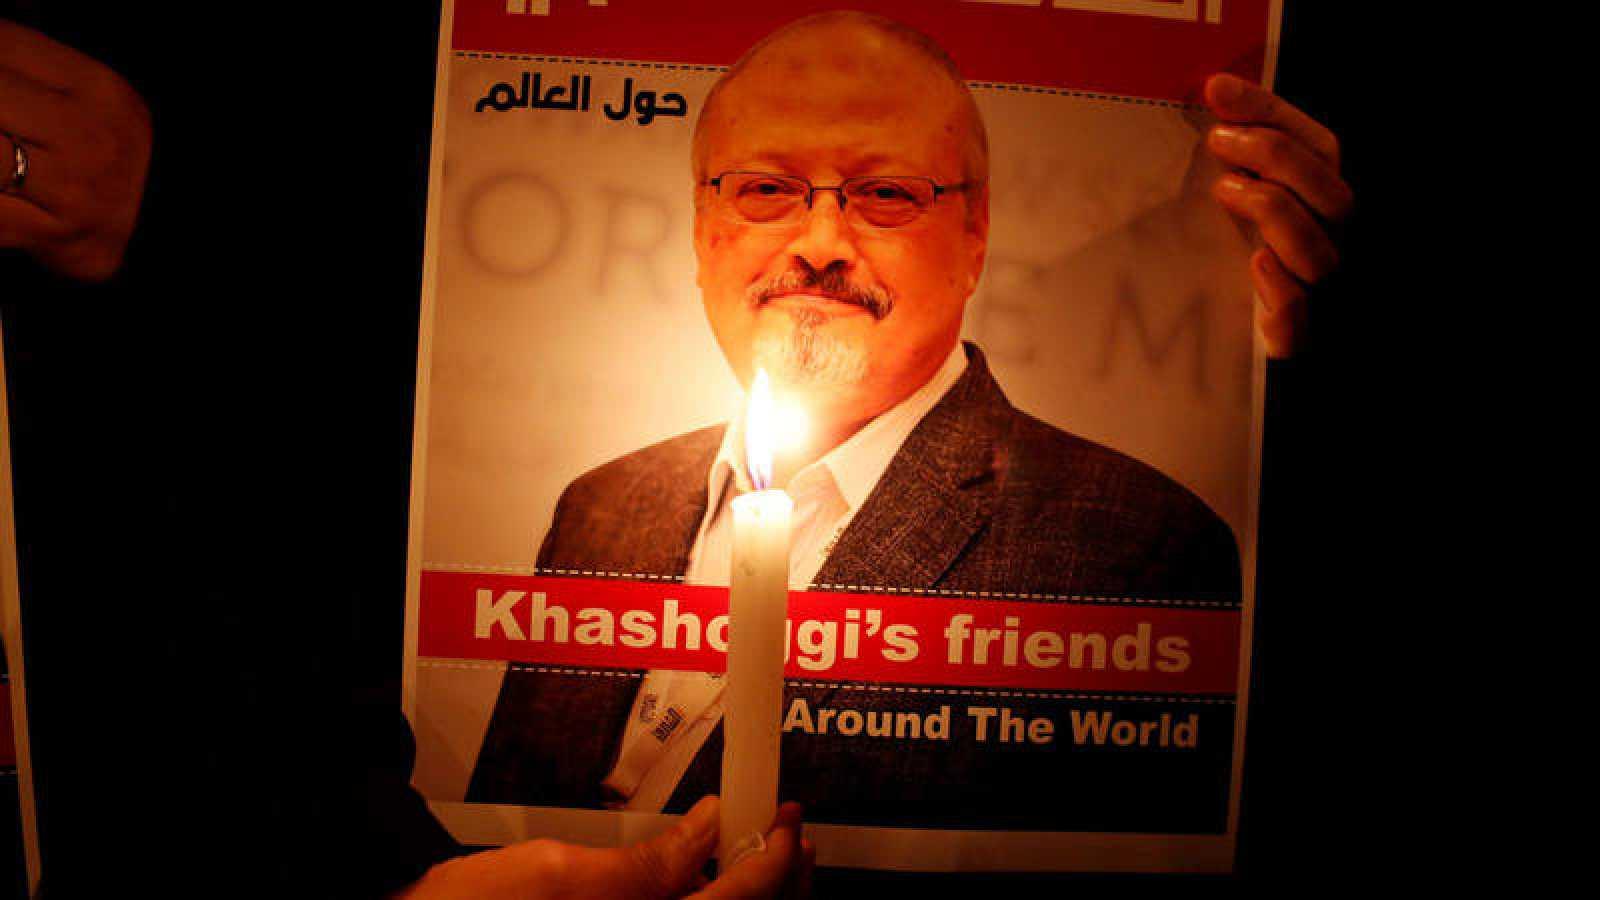 Un manifestante homenajea a Jamal Khashoggi en Estambul